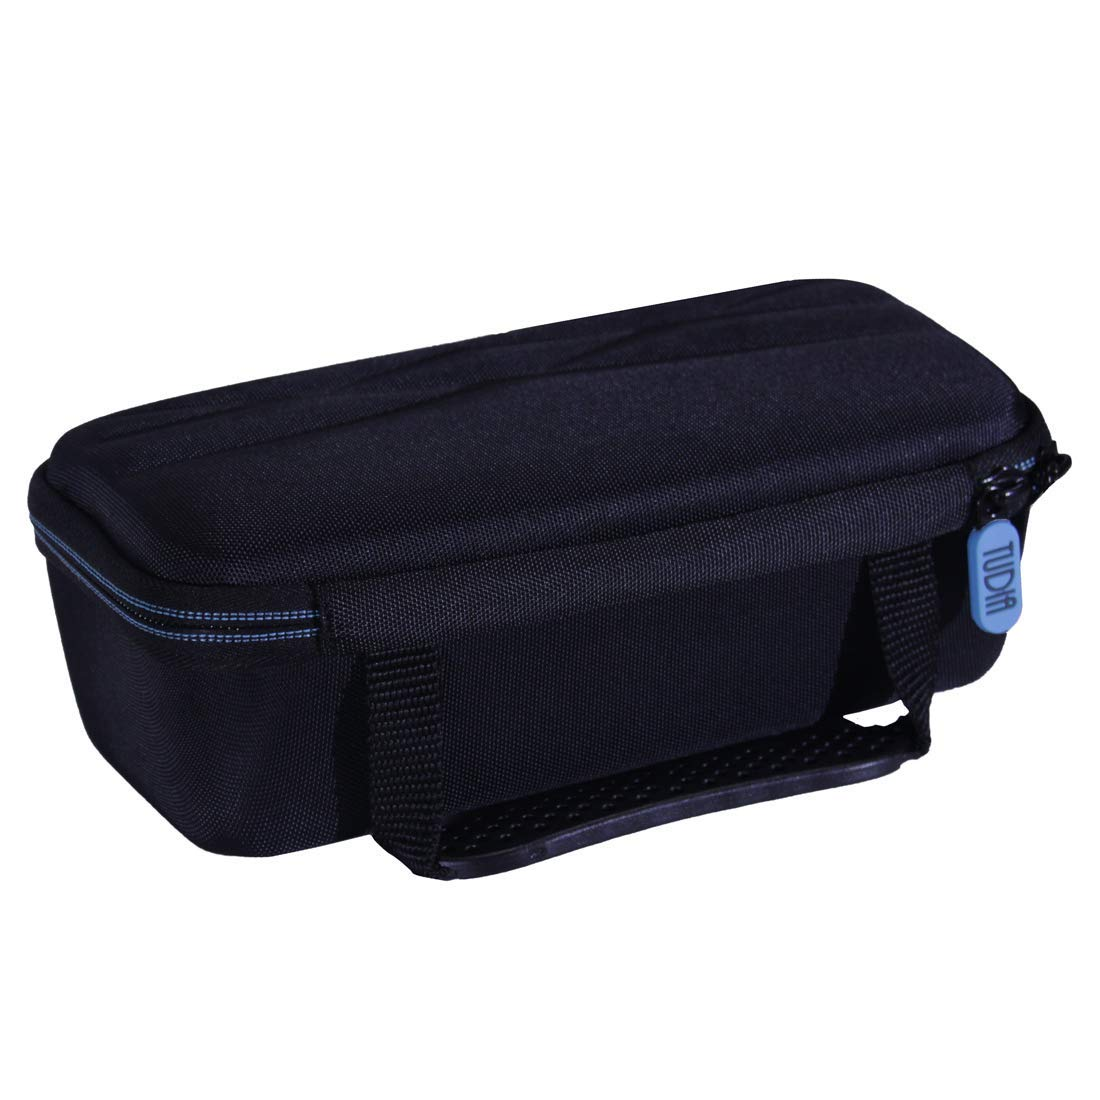 Black TUDIA Hard Travel EVA Shock Absorption Carrying Storage Case Compatible with Tronsmart Mega Bluetooth 4.2 40W Bluetooth Speaker